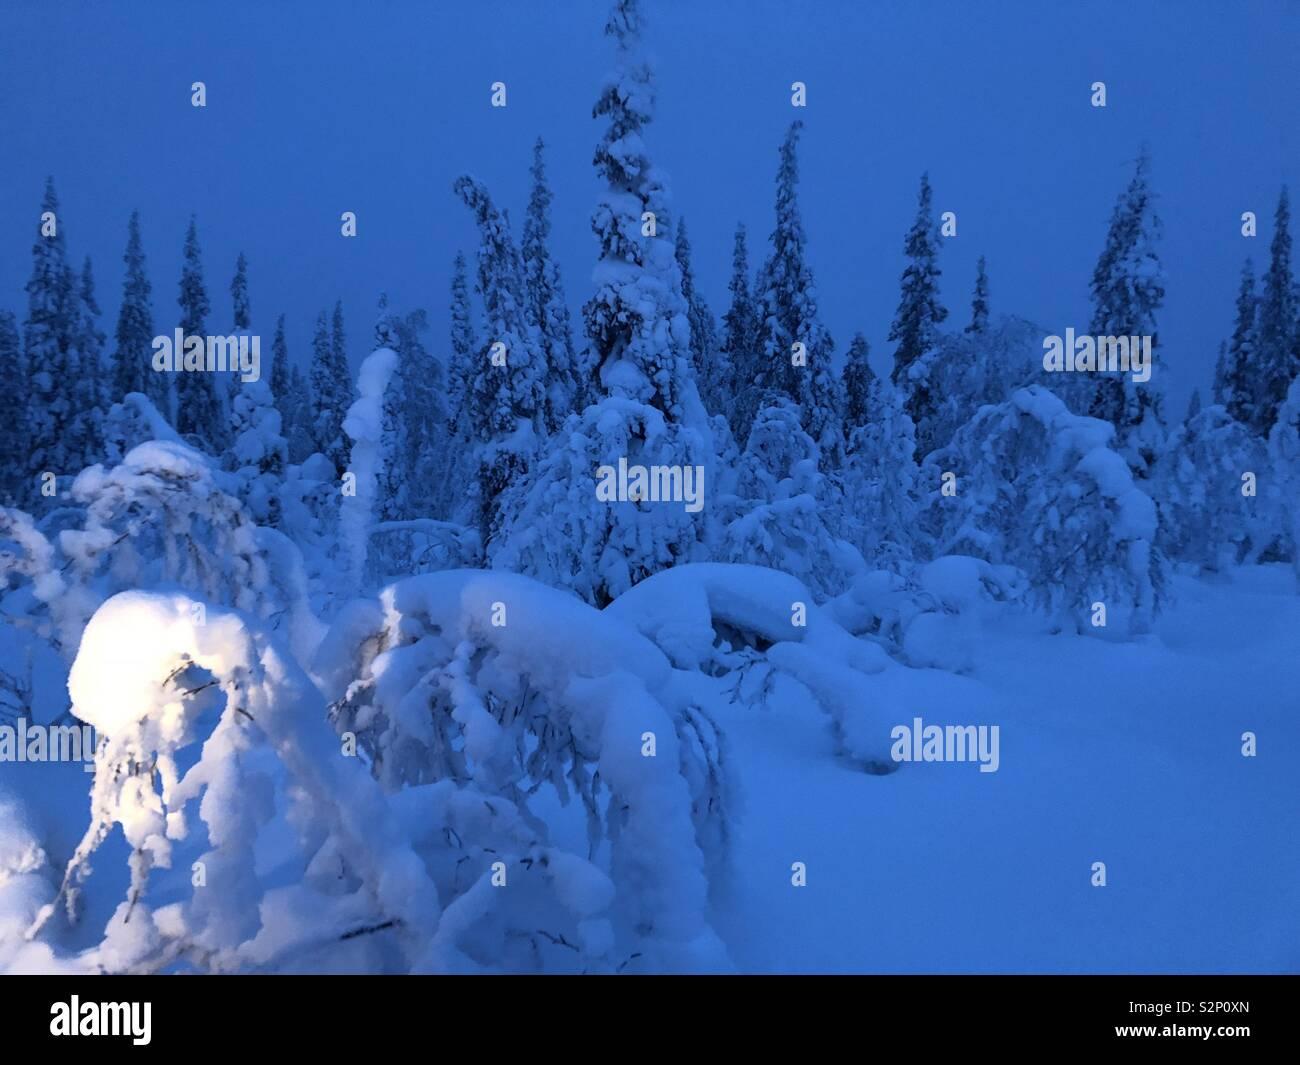 Swedish Lapland 110km inside the arctic circle - Stock Image